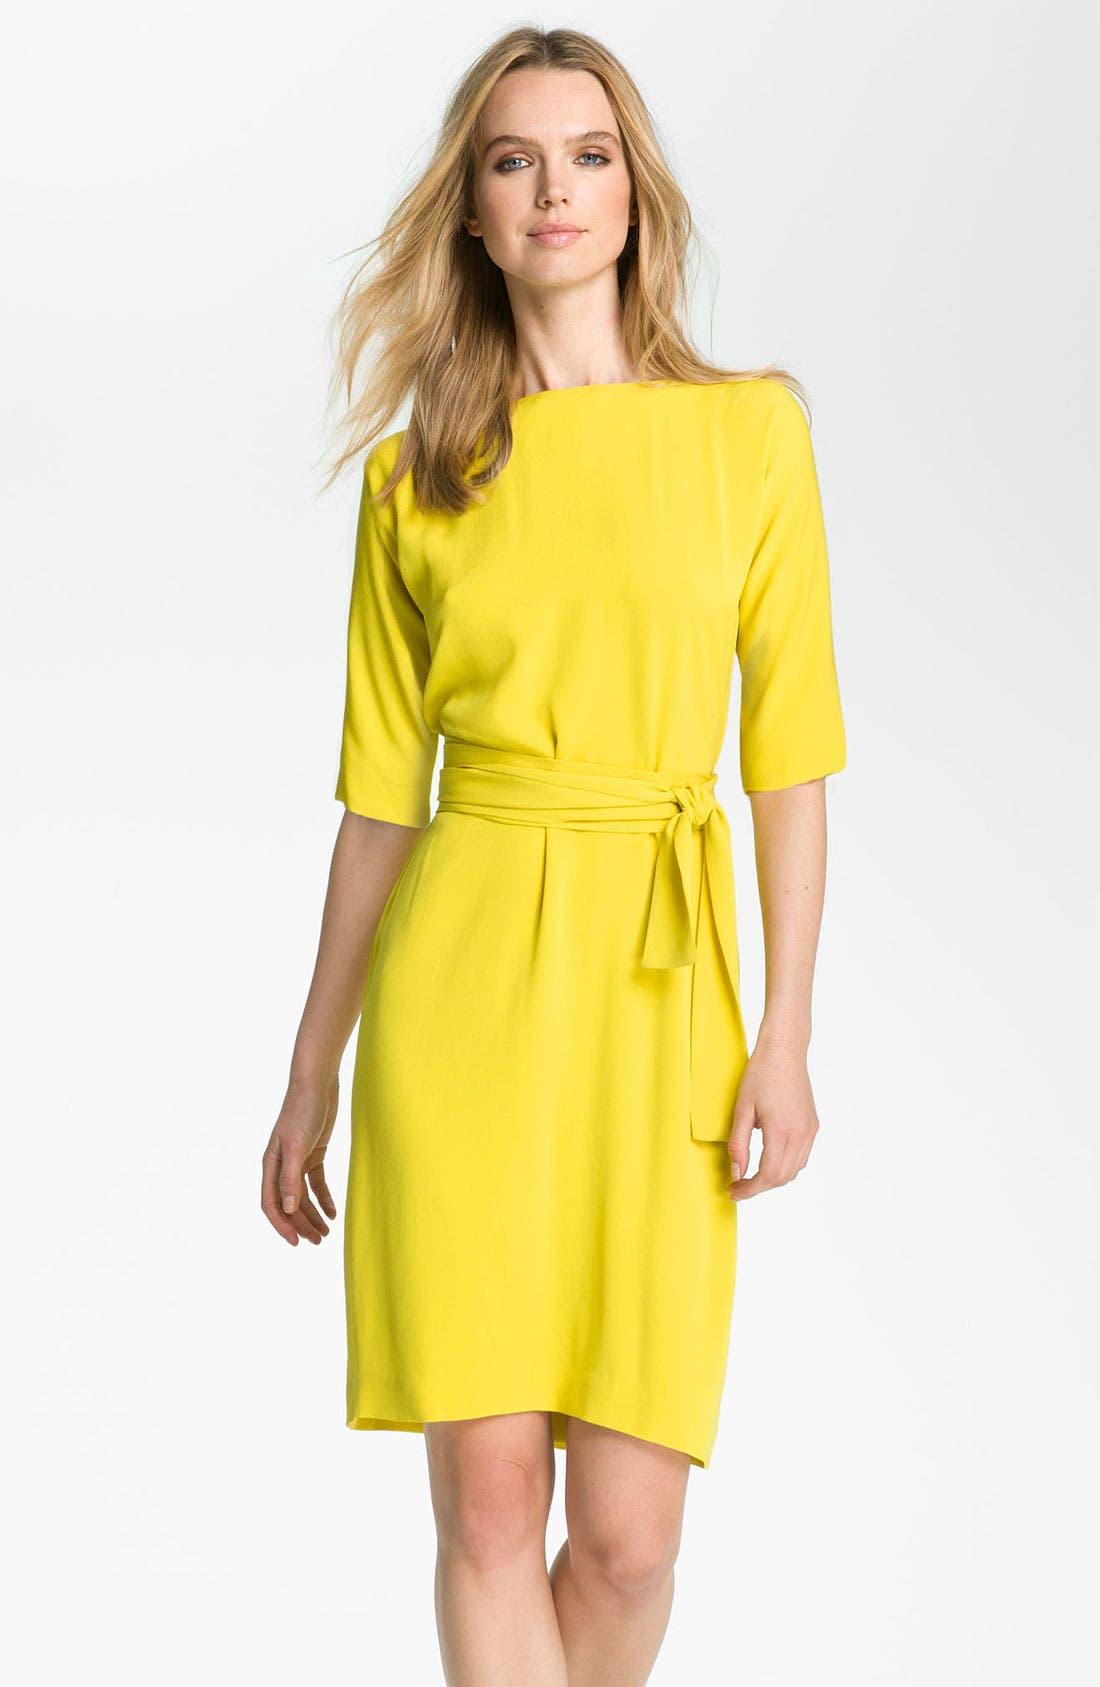 Alternate Image 1 Selected - Diane von Furstenberg 'Shannon' Silk Wrap Dress